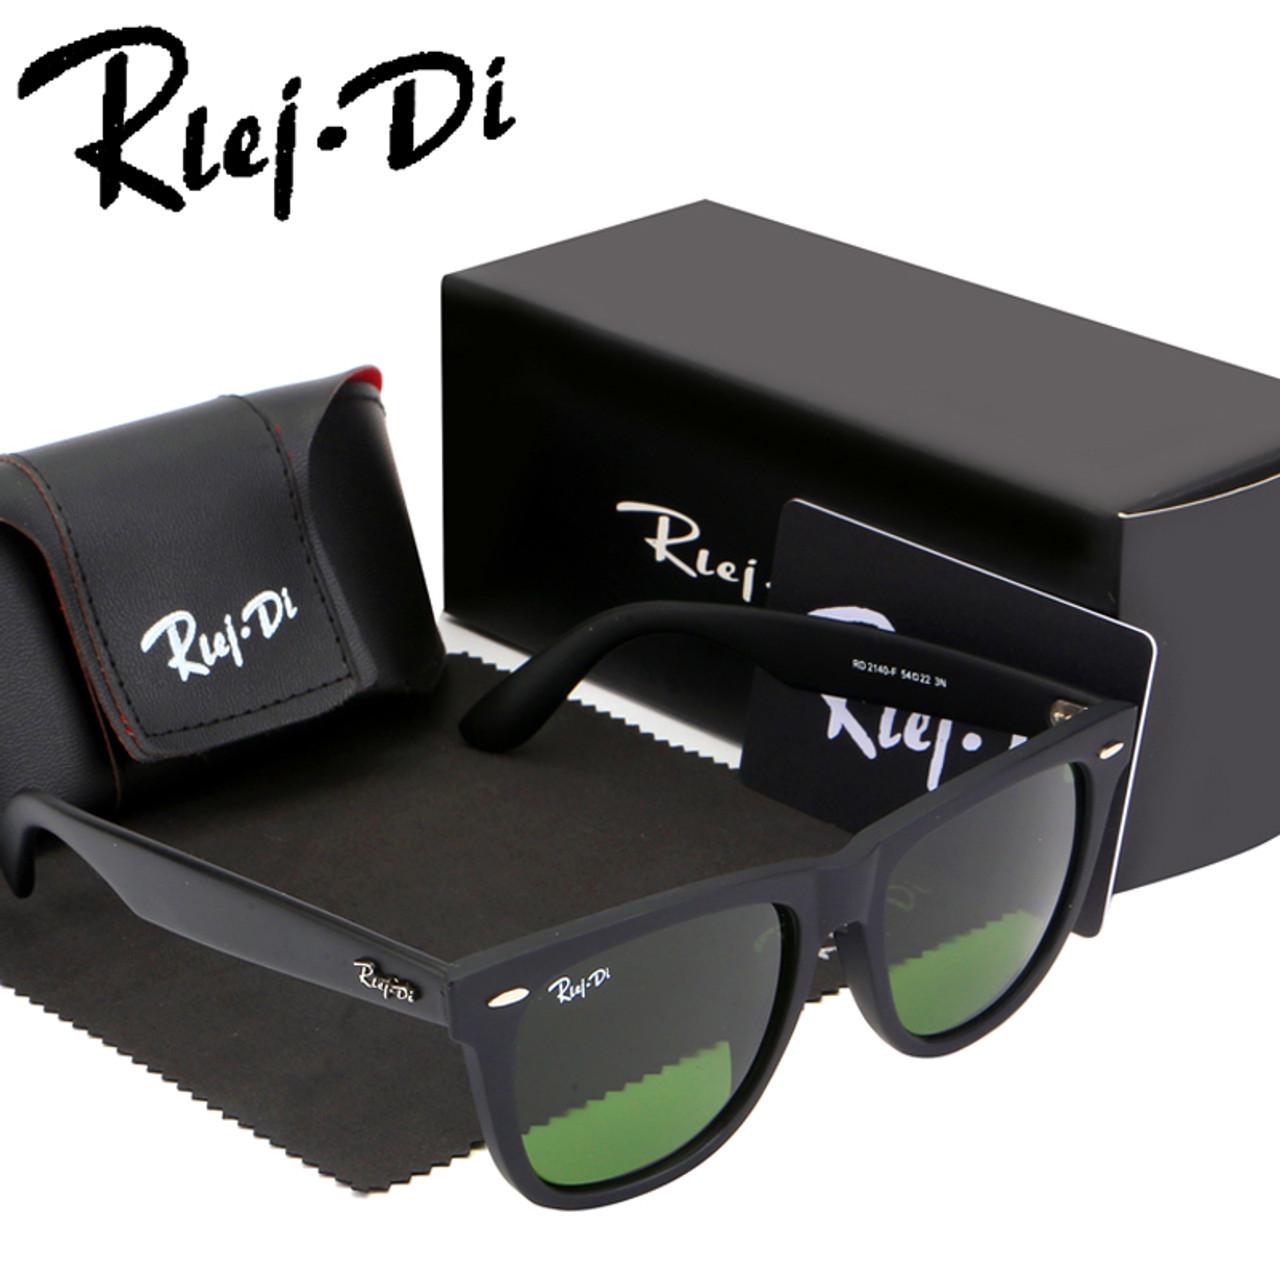 54MM Vintage Sunglasses Women Rivet Glasses Lens Shades Brand Designer  Driving Sunglasses Men Eyewear Male Female Oculos UV400 - OnshopDeals.Com 1ee2307575